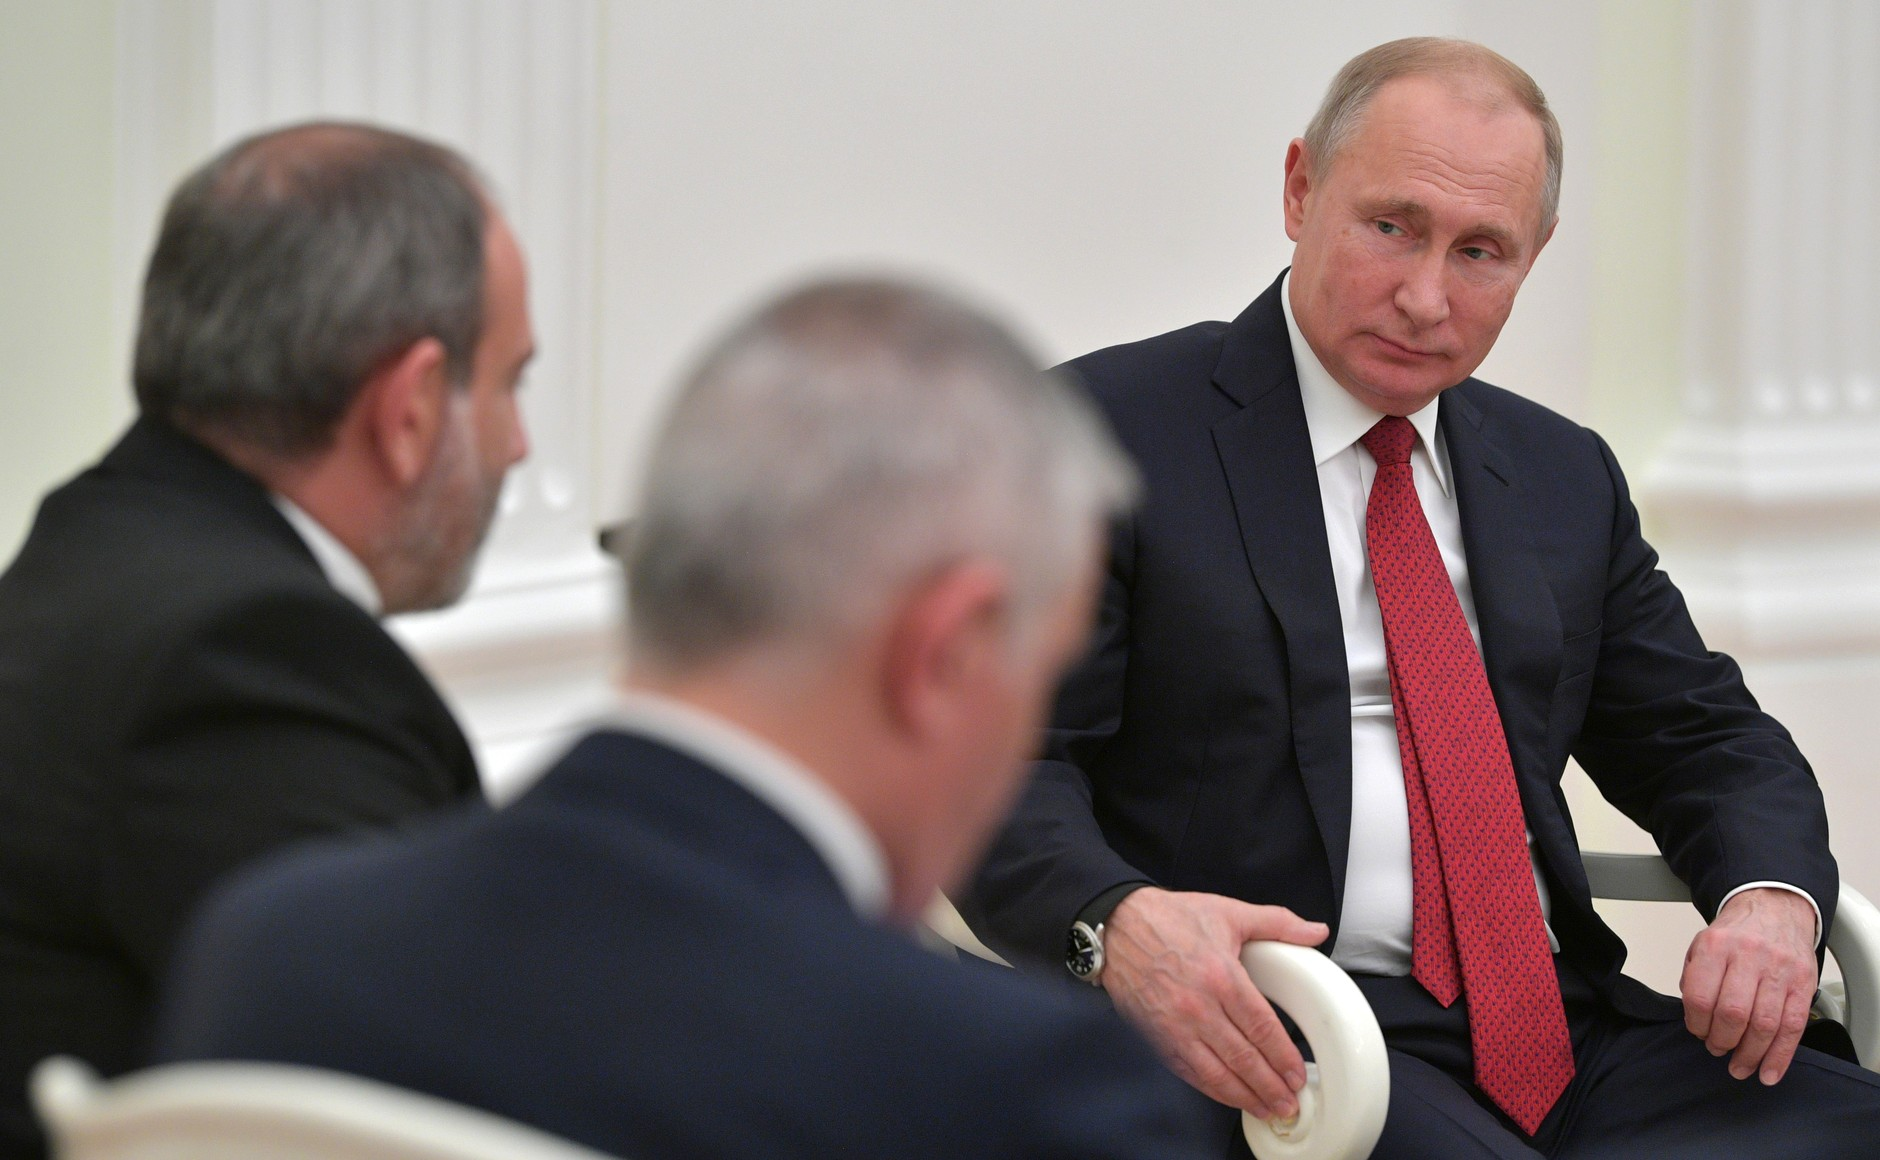 Pashinyan Putin 14 Карабах Карабах